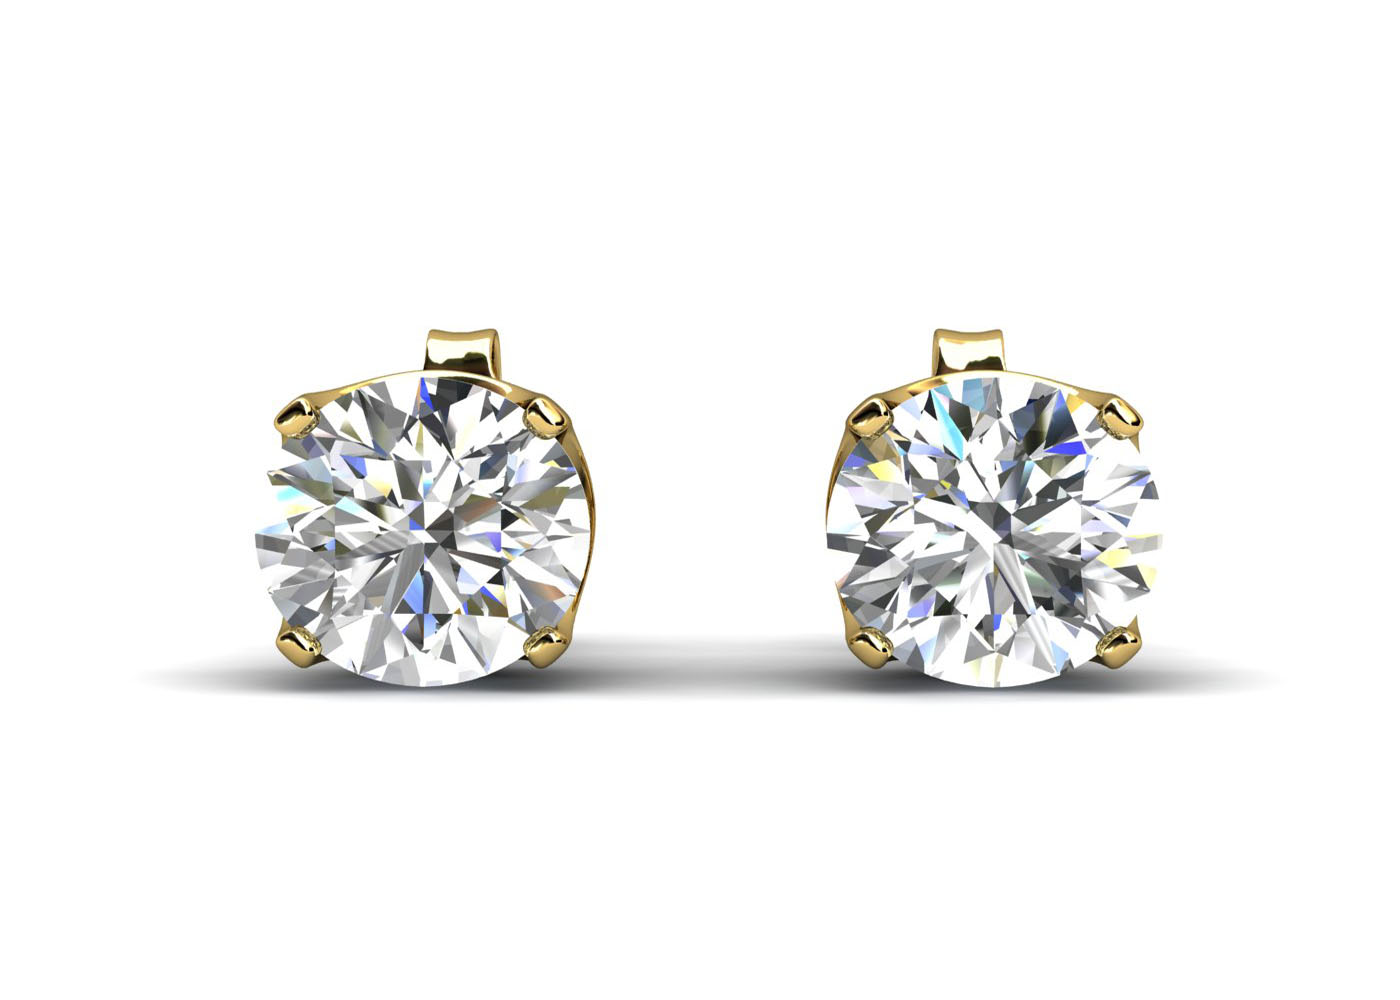 9ct Claw Set Diamond Earrings 0.40 Carats